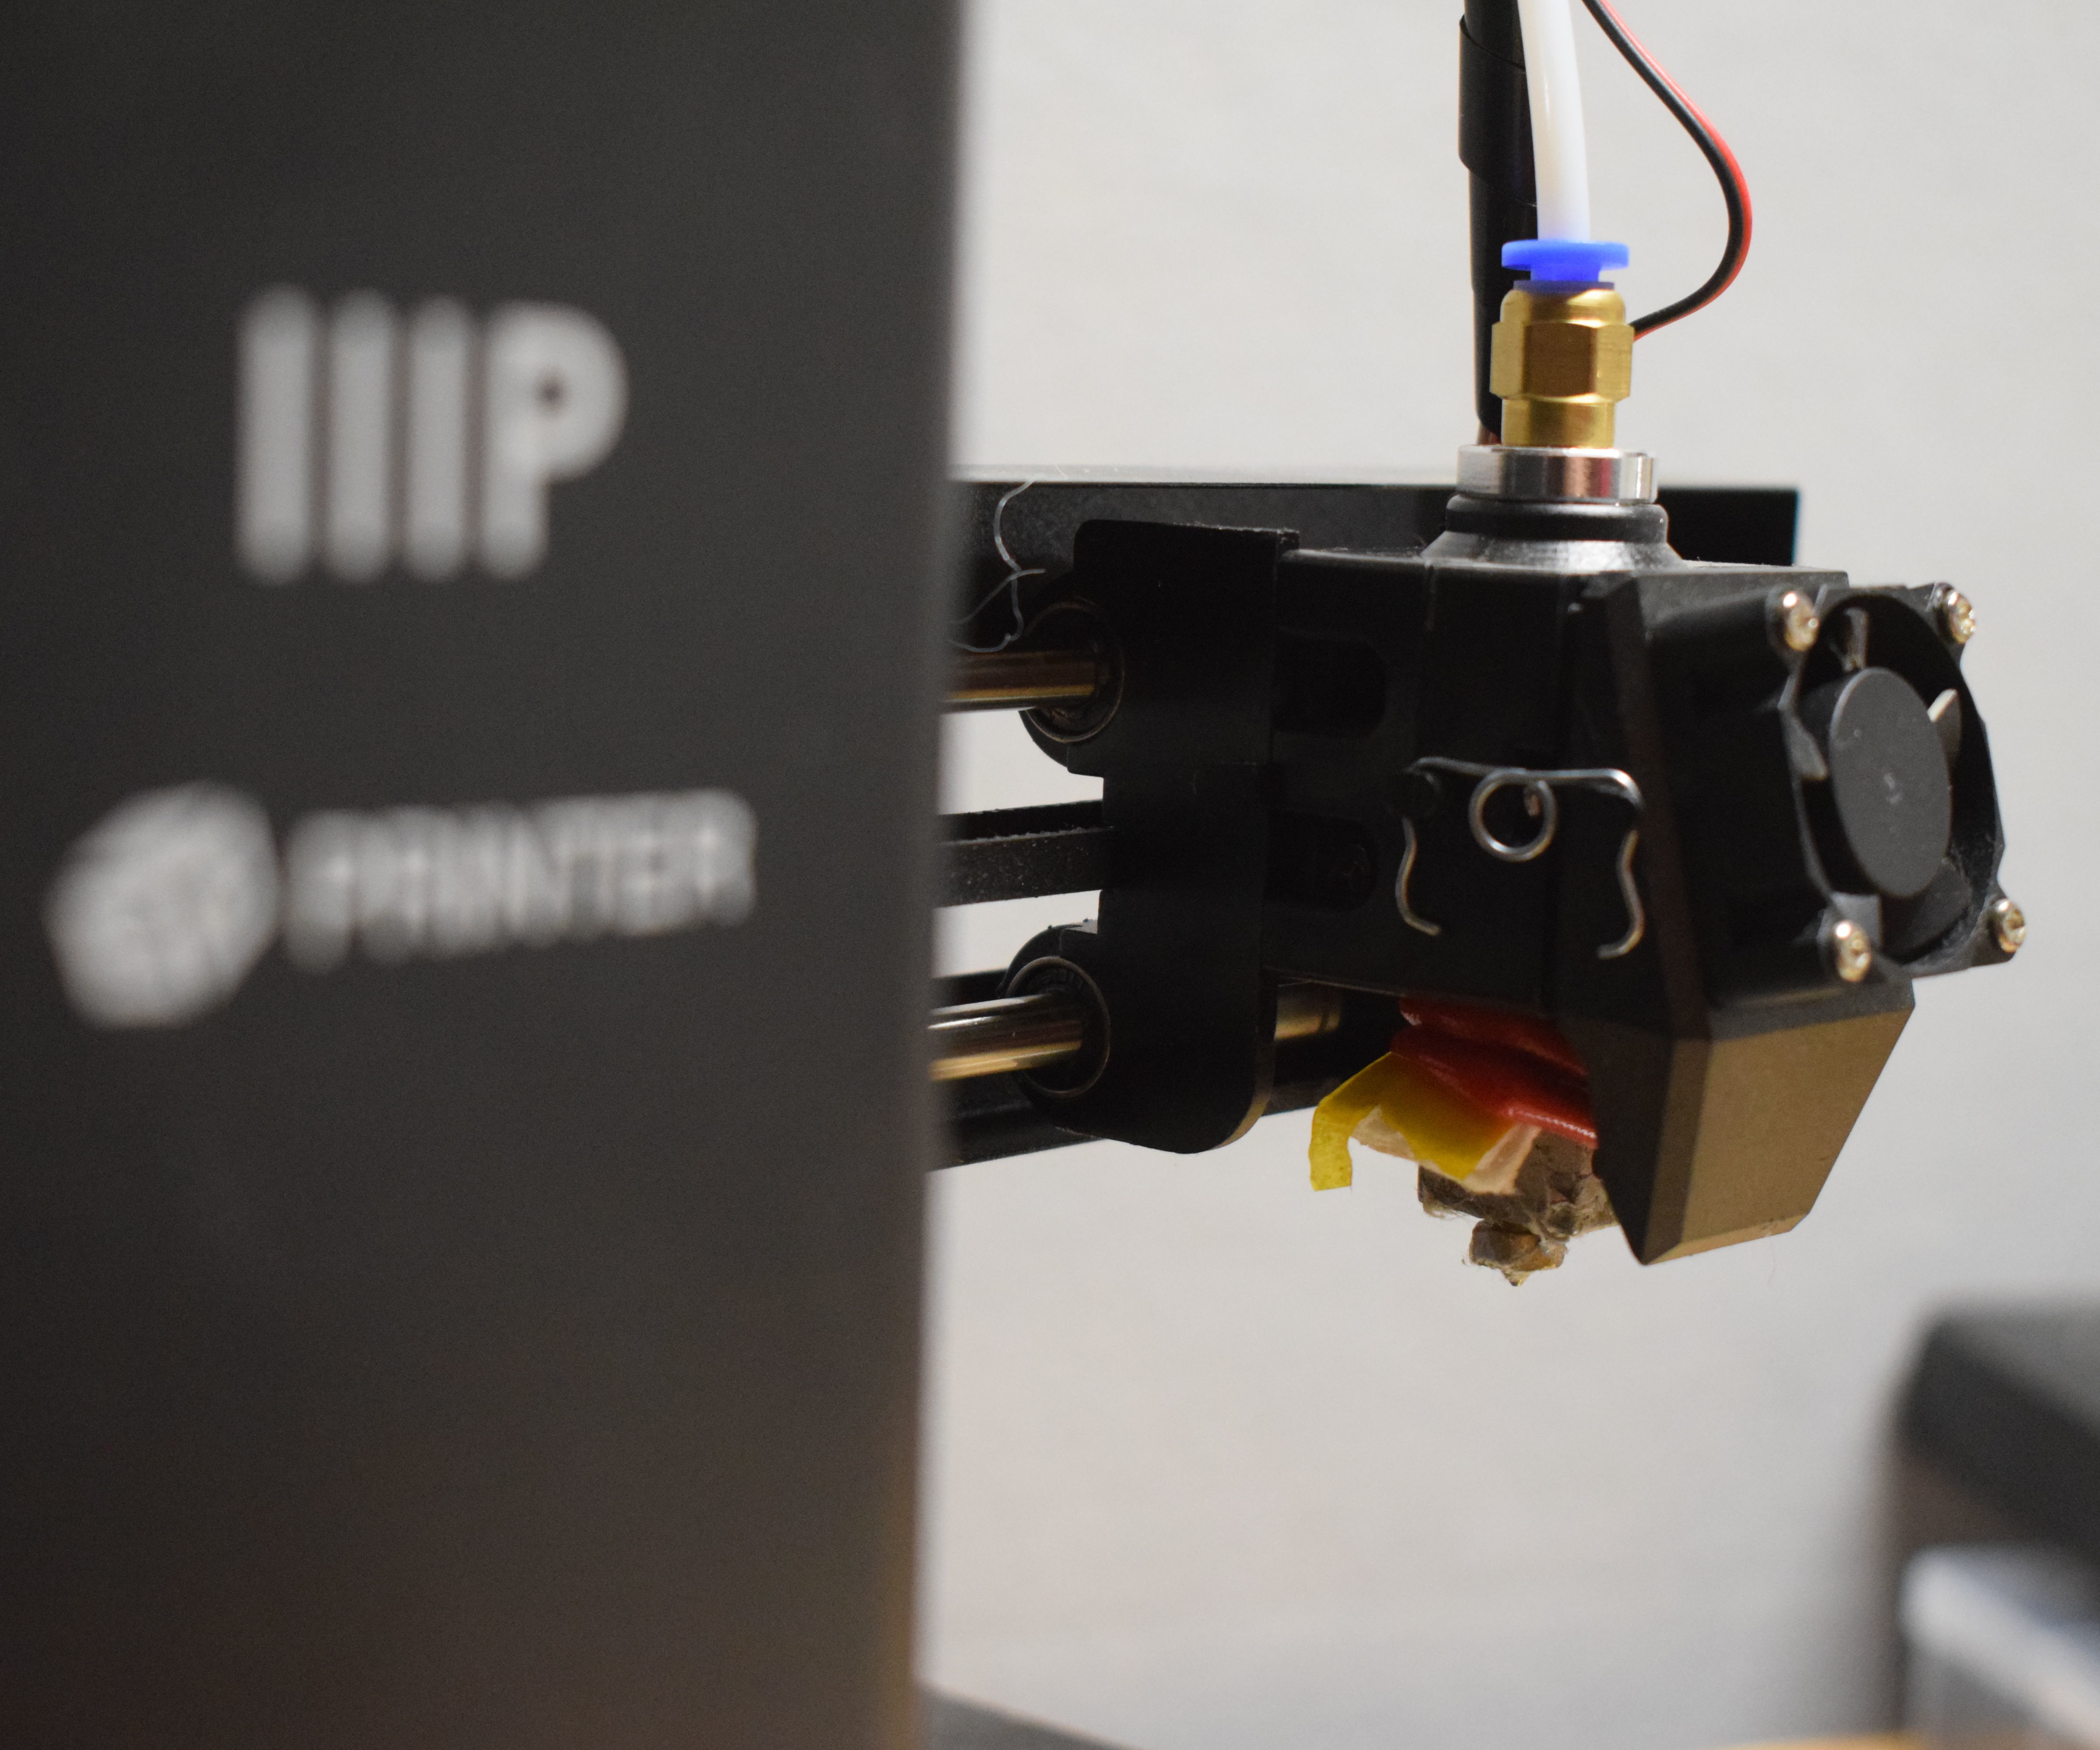 3D Printer Insulator Replacement Monoprice Select Mini